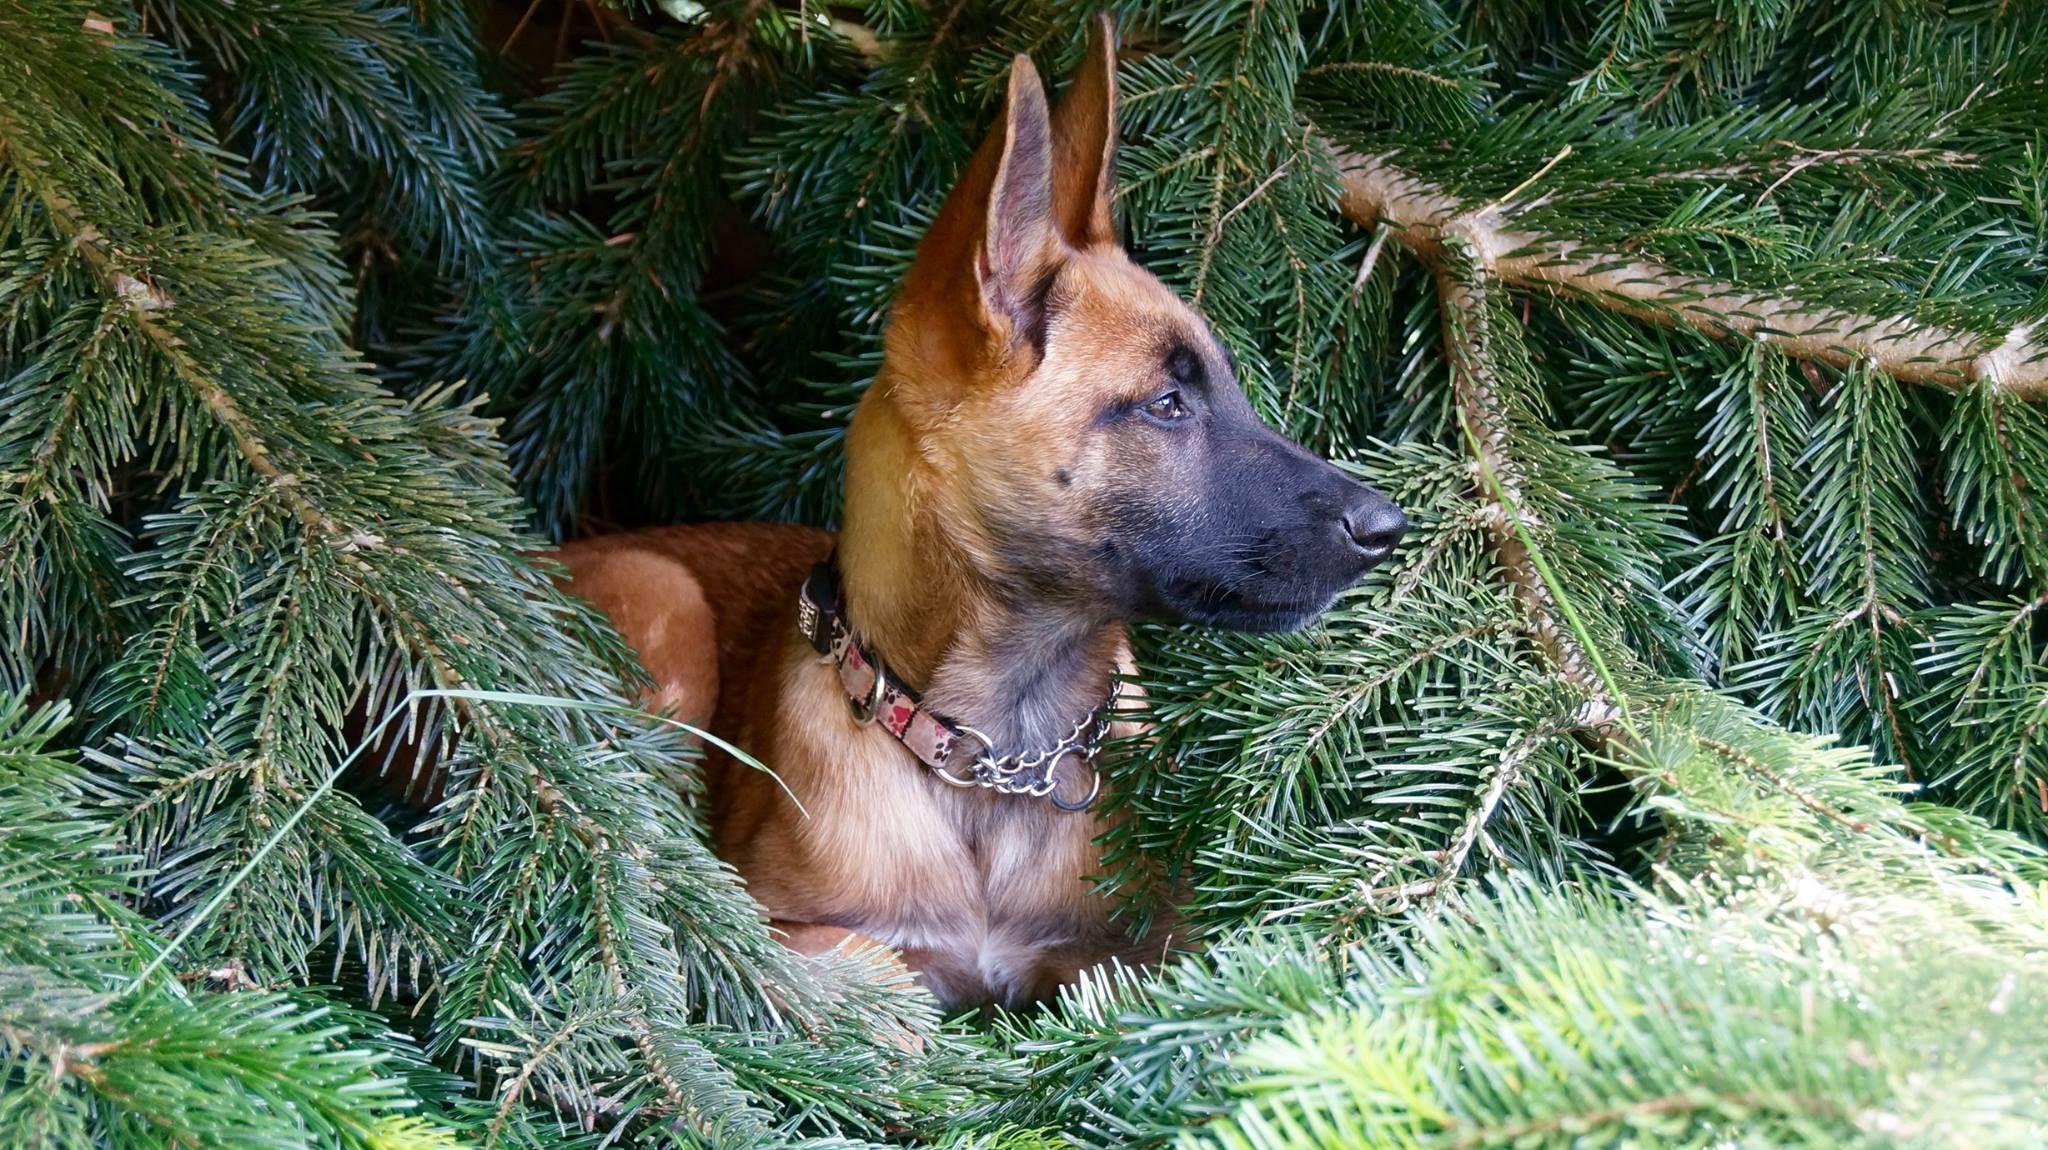 Belgian malinois rescue adoption in 2020 malinois dog